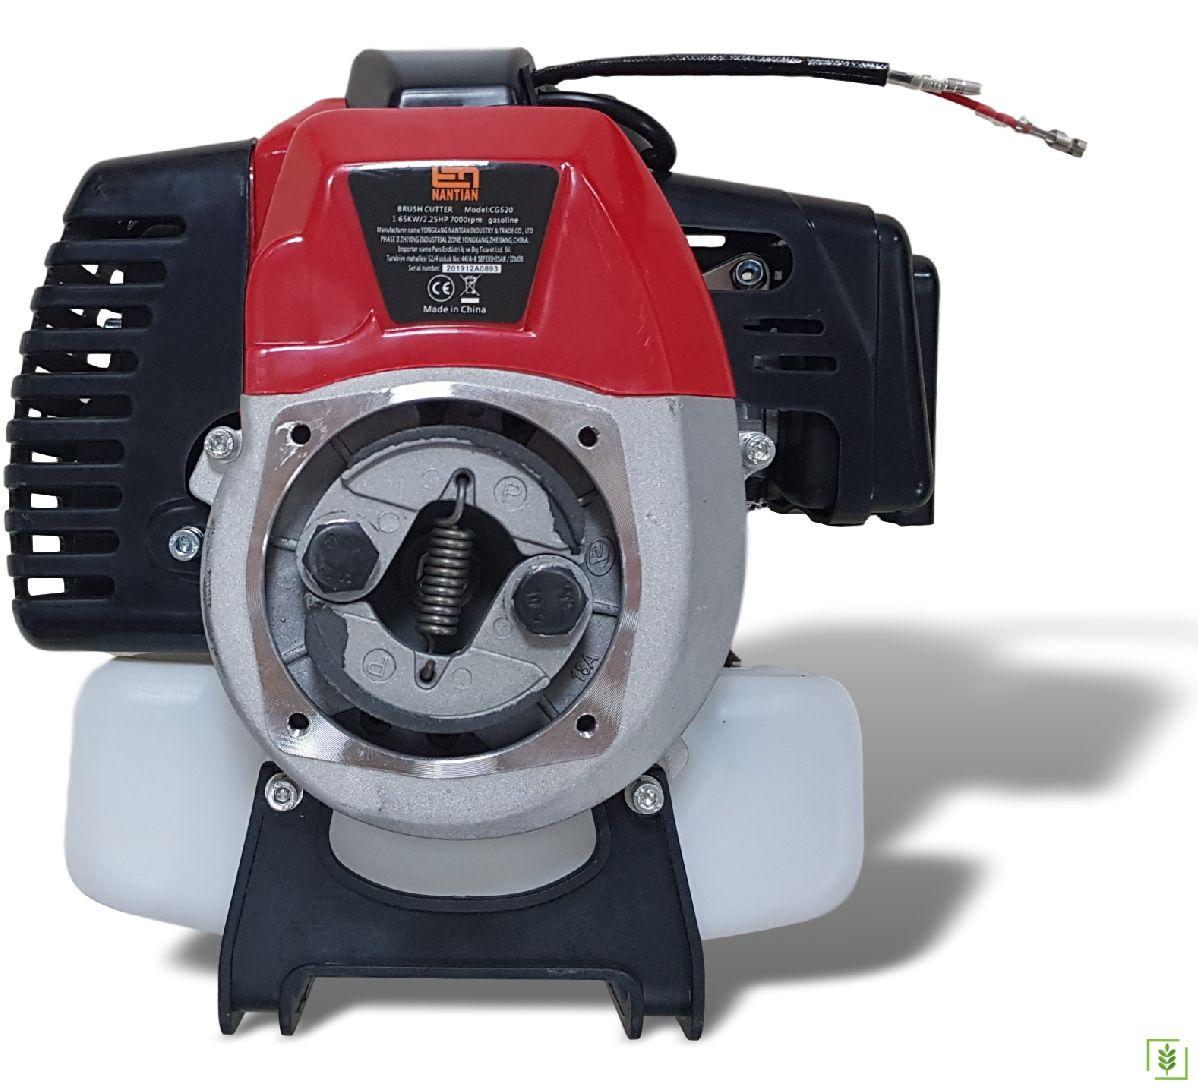 Garden Pro BG/CG 520 Benzinli Tırpan Motoru 2.2 Hp